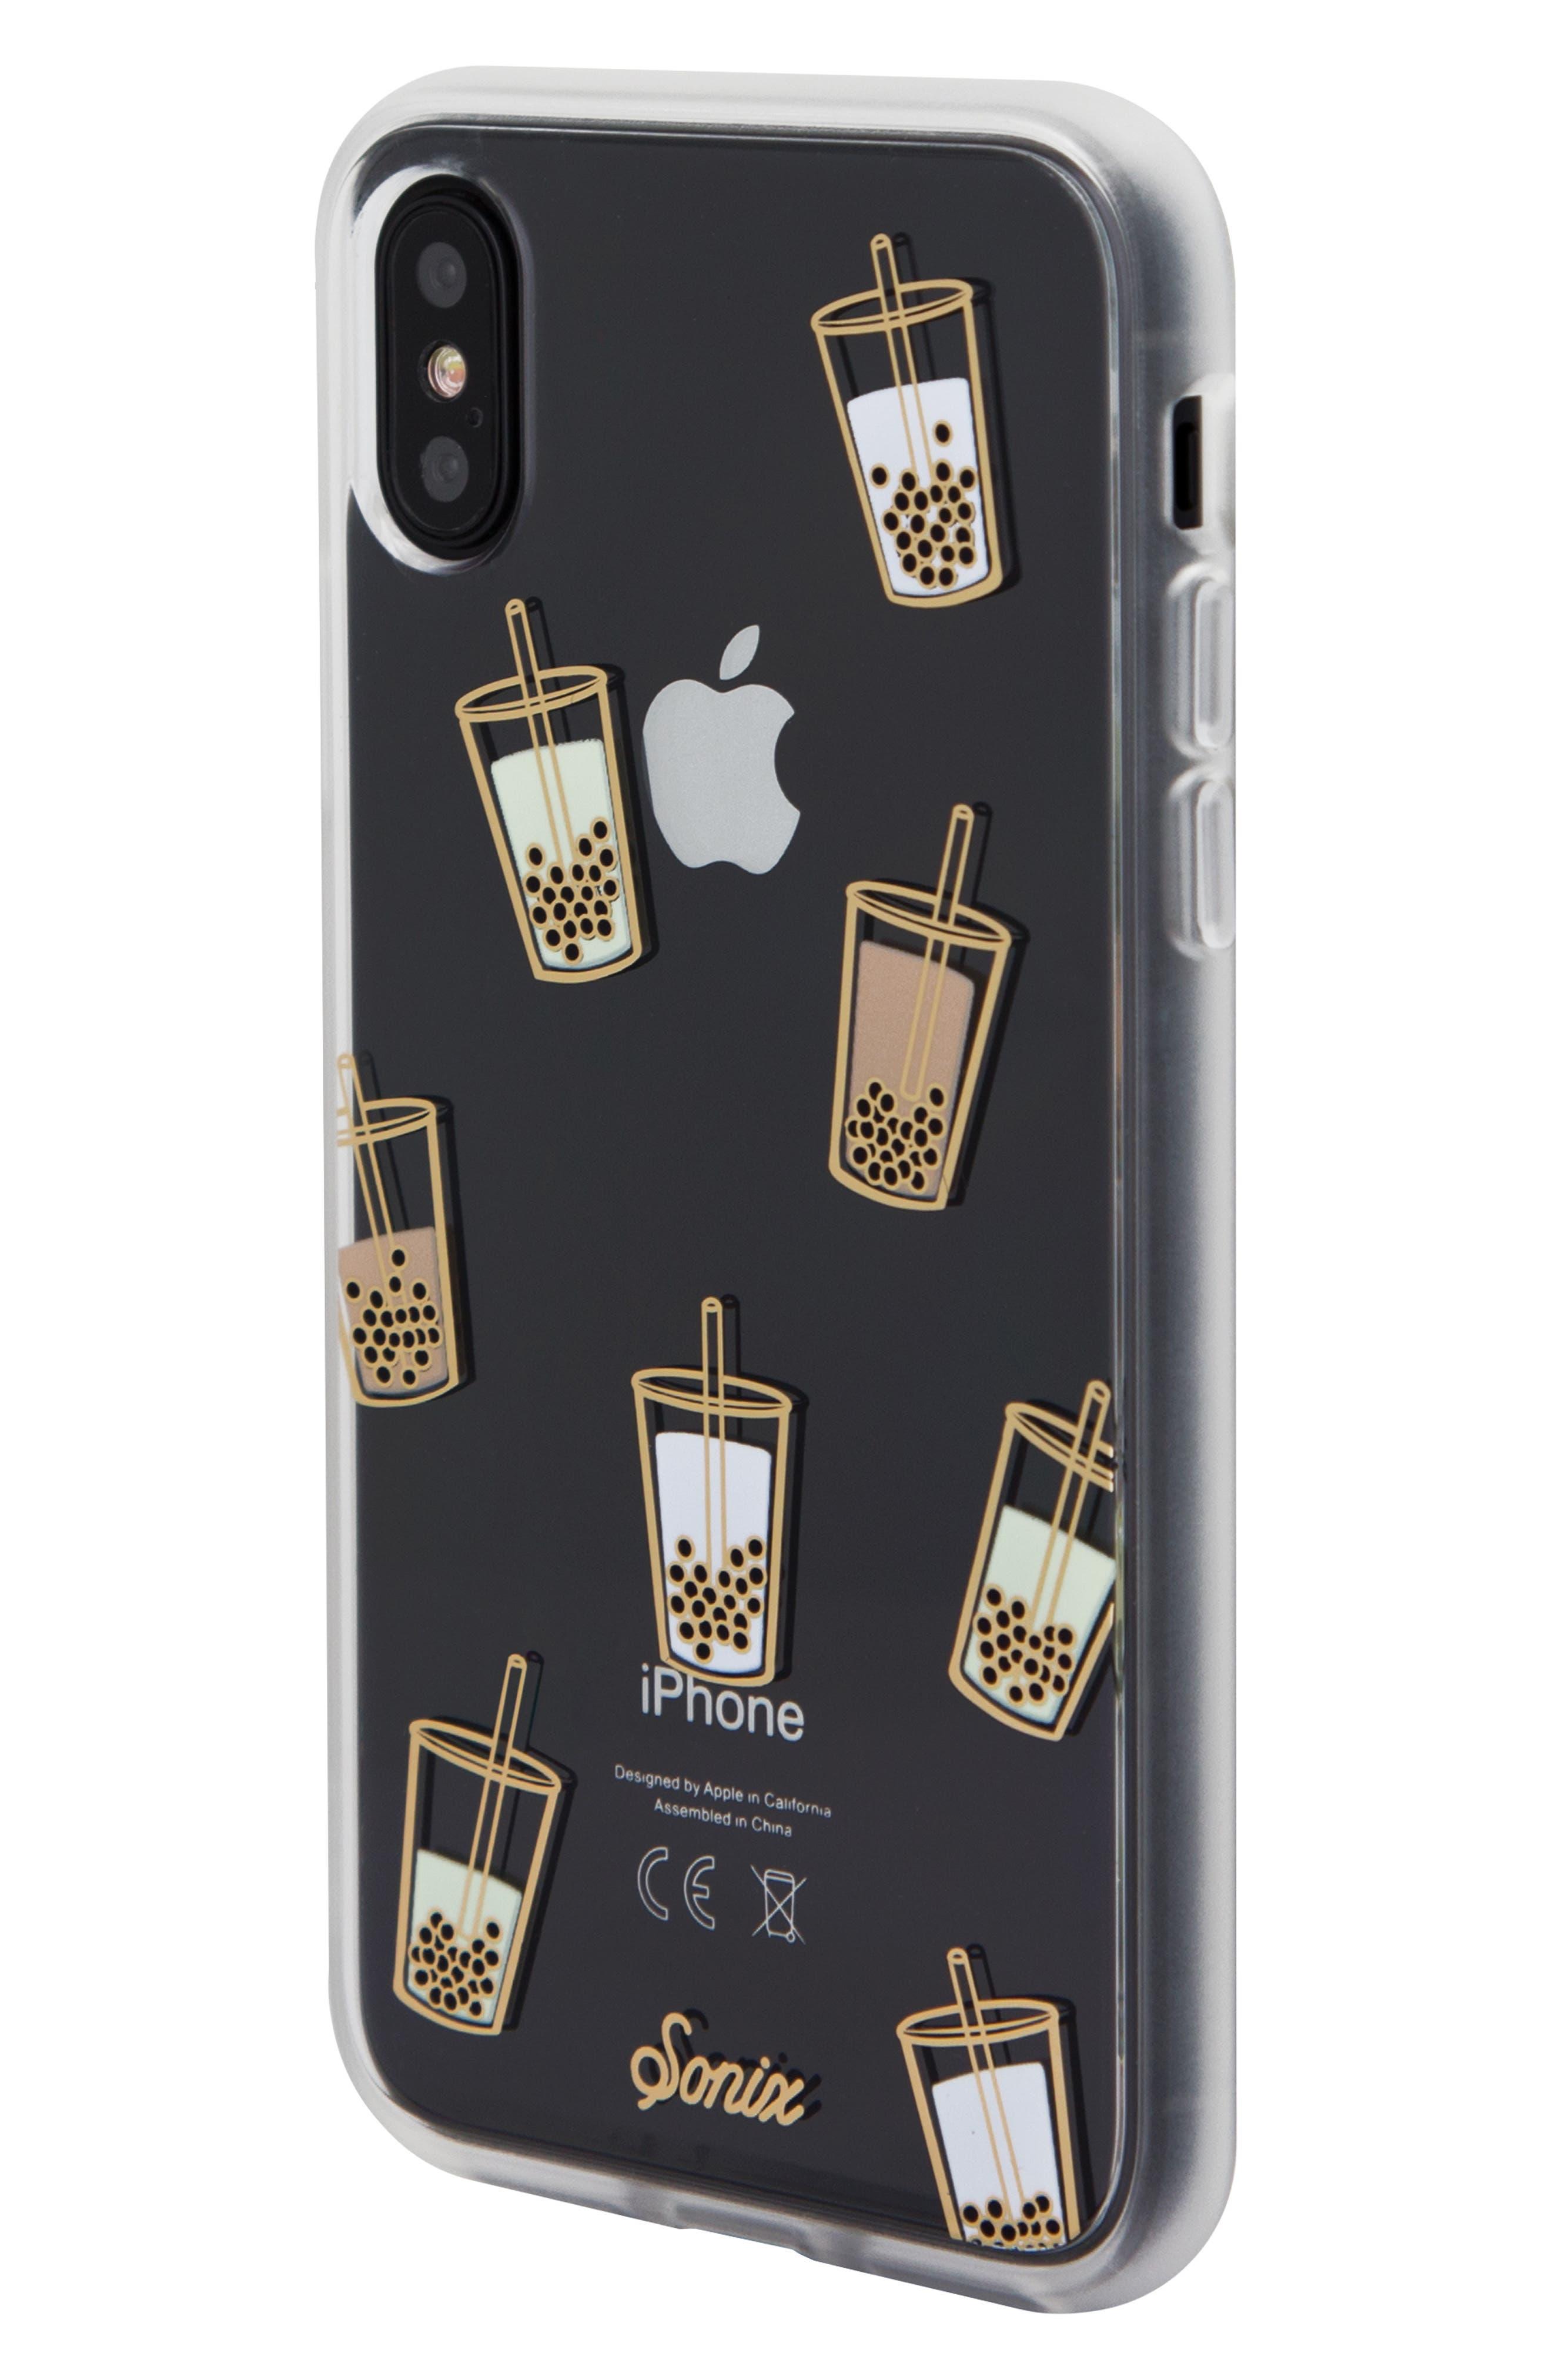 Boba iPhone X/Xs, XR & X Max Case,                             Alternate thumbnail 2, color,                             MULTI